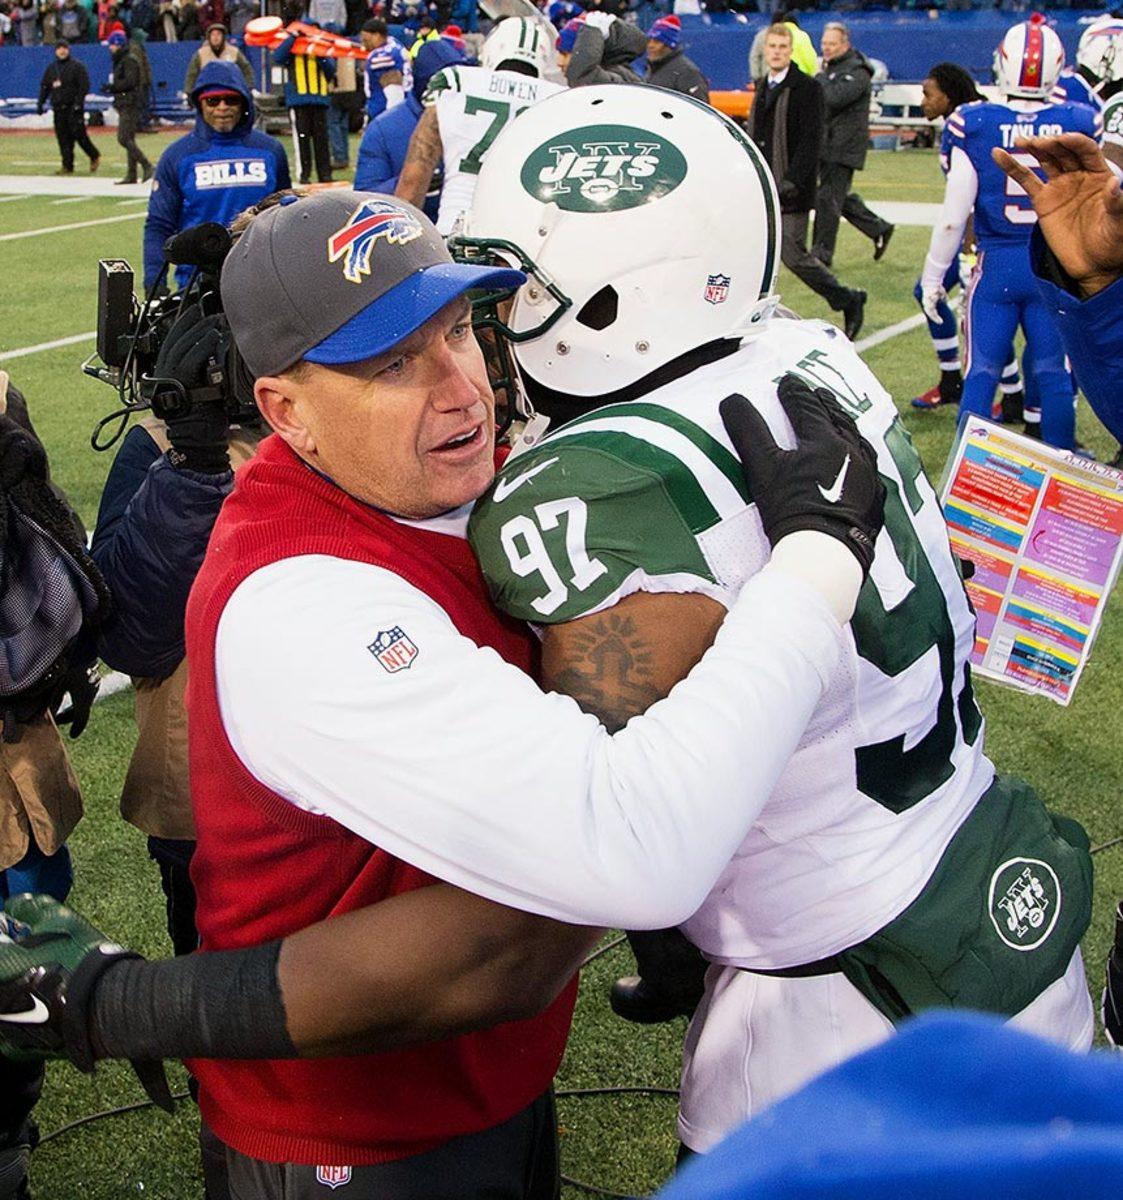 21-NFL-Week-17-Bills-Jets-Rex-Ryan-Calvin-Pace.jpg